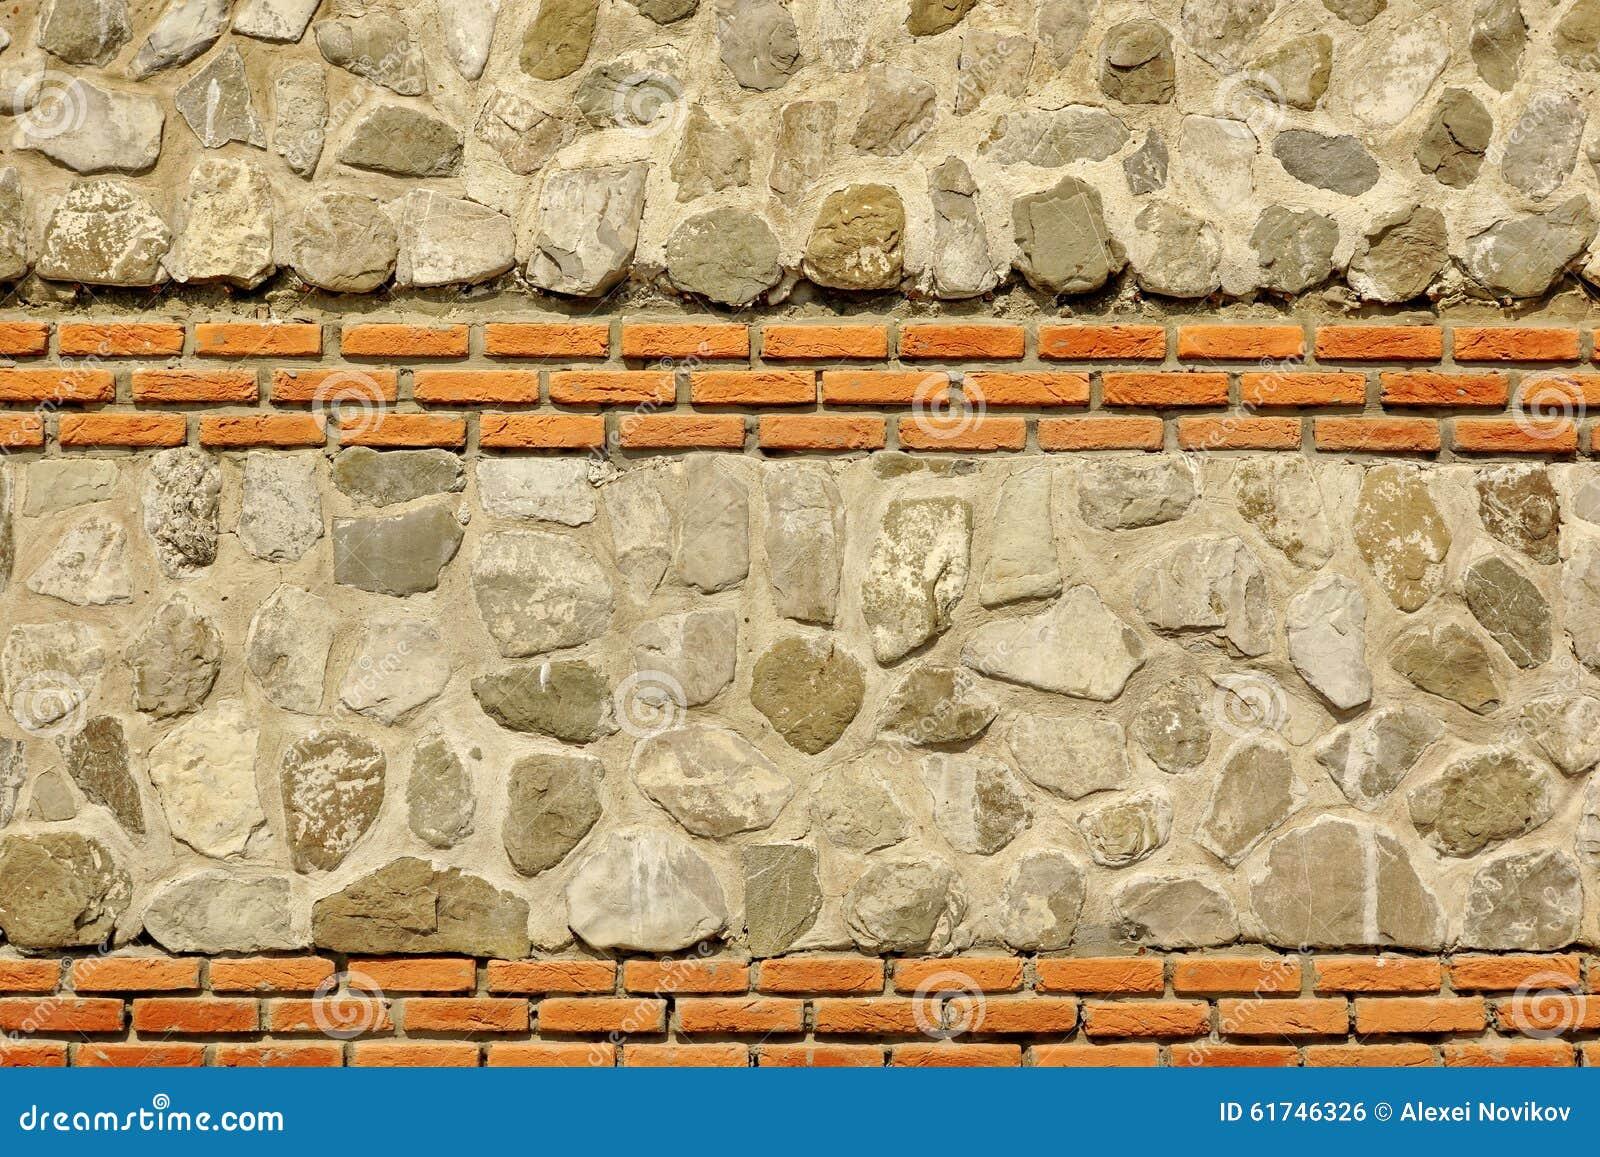 Modern Combo Masonry With Natural Stones And Bricks Texture Stock ...